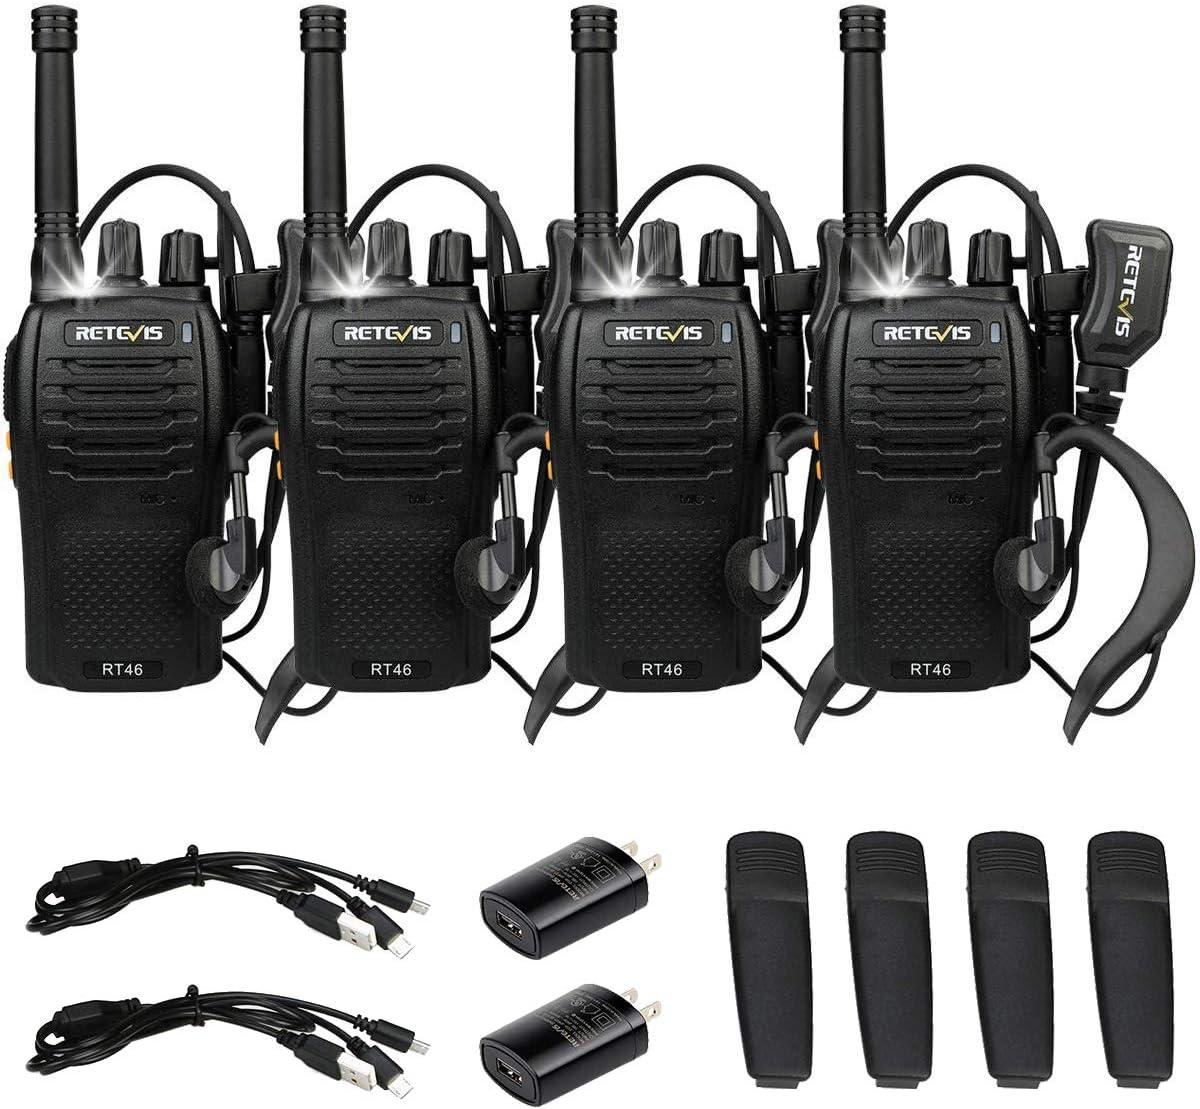 Retevis RT46 Walkie Talkie Rechargeable Long Range Two Way Radio with Earpiece Emergency Flashlight SOS Dual Power VOX 2 Way Radio Adult(4 Pack)